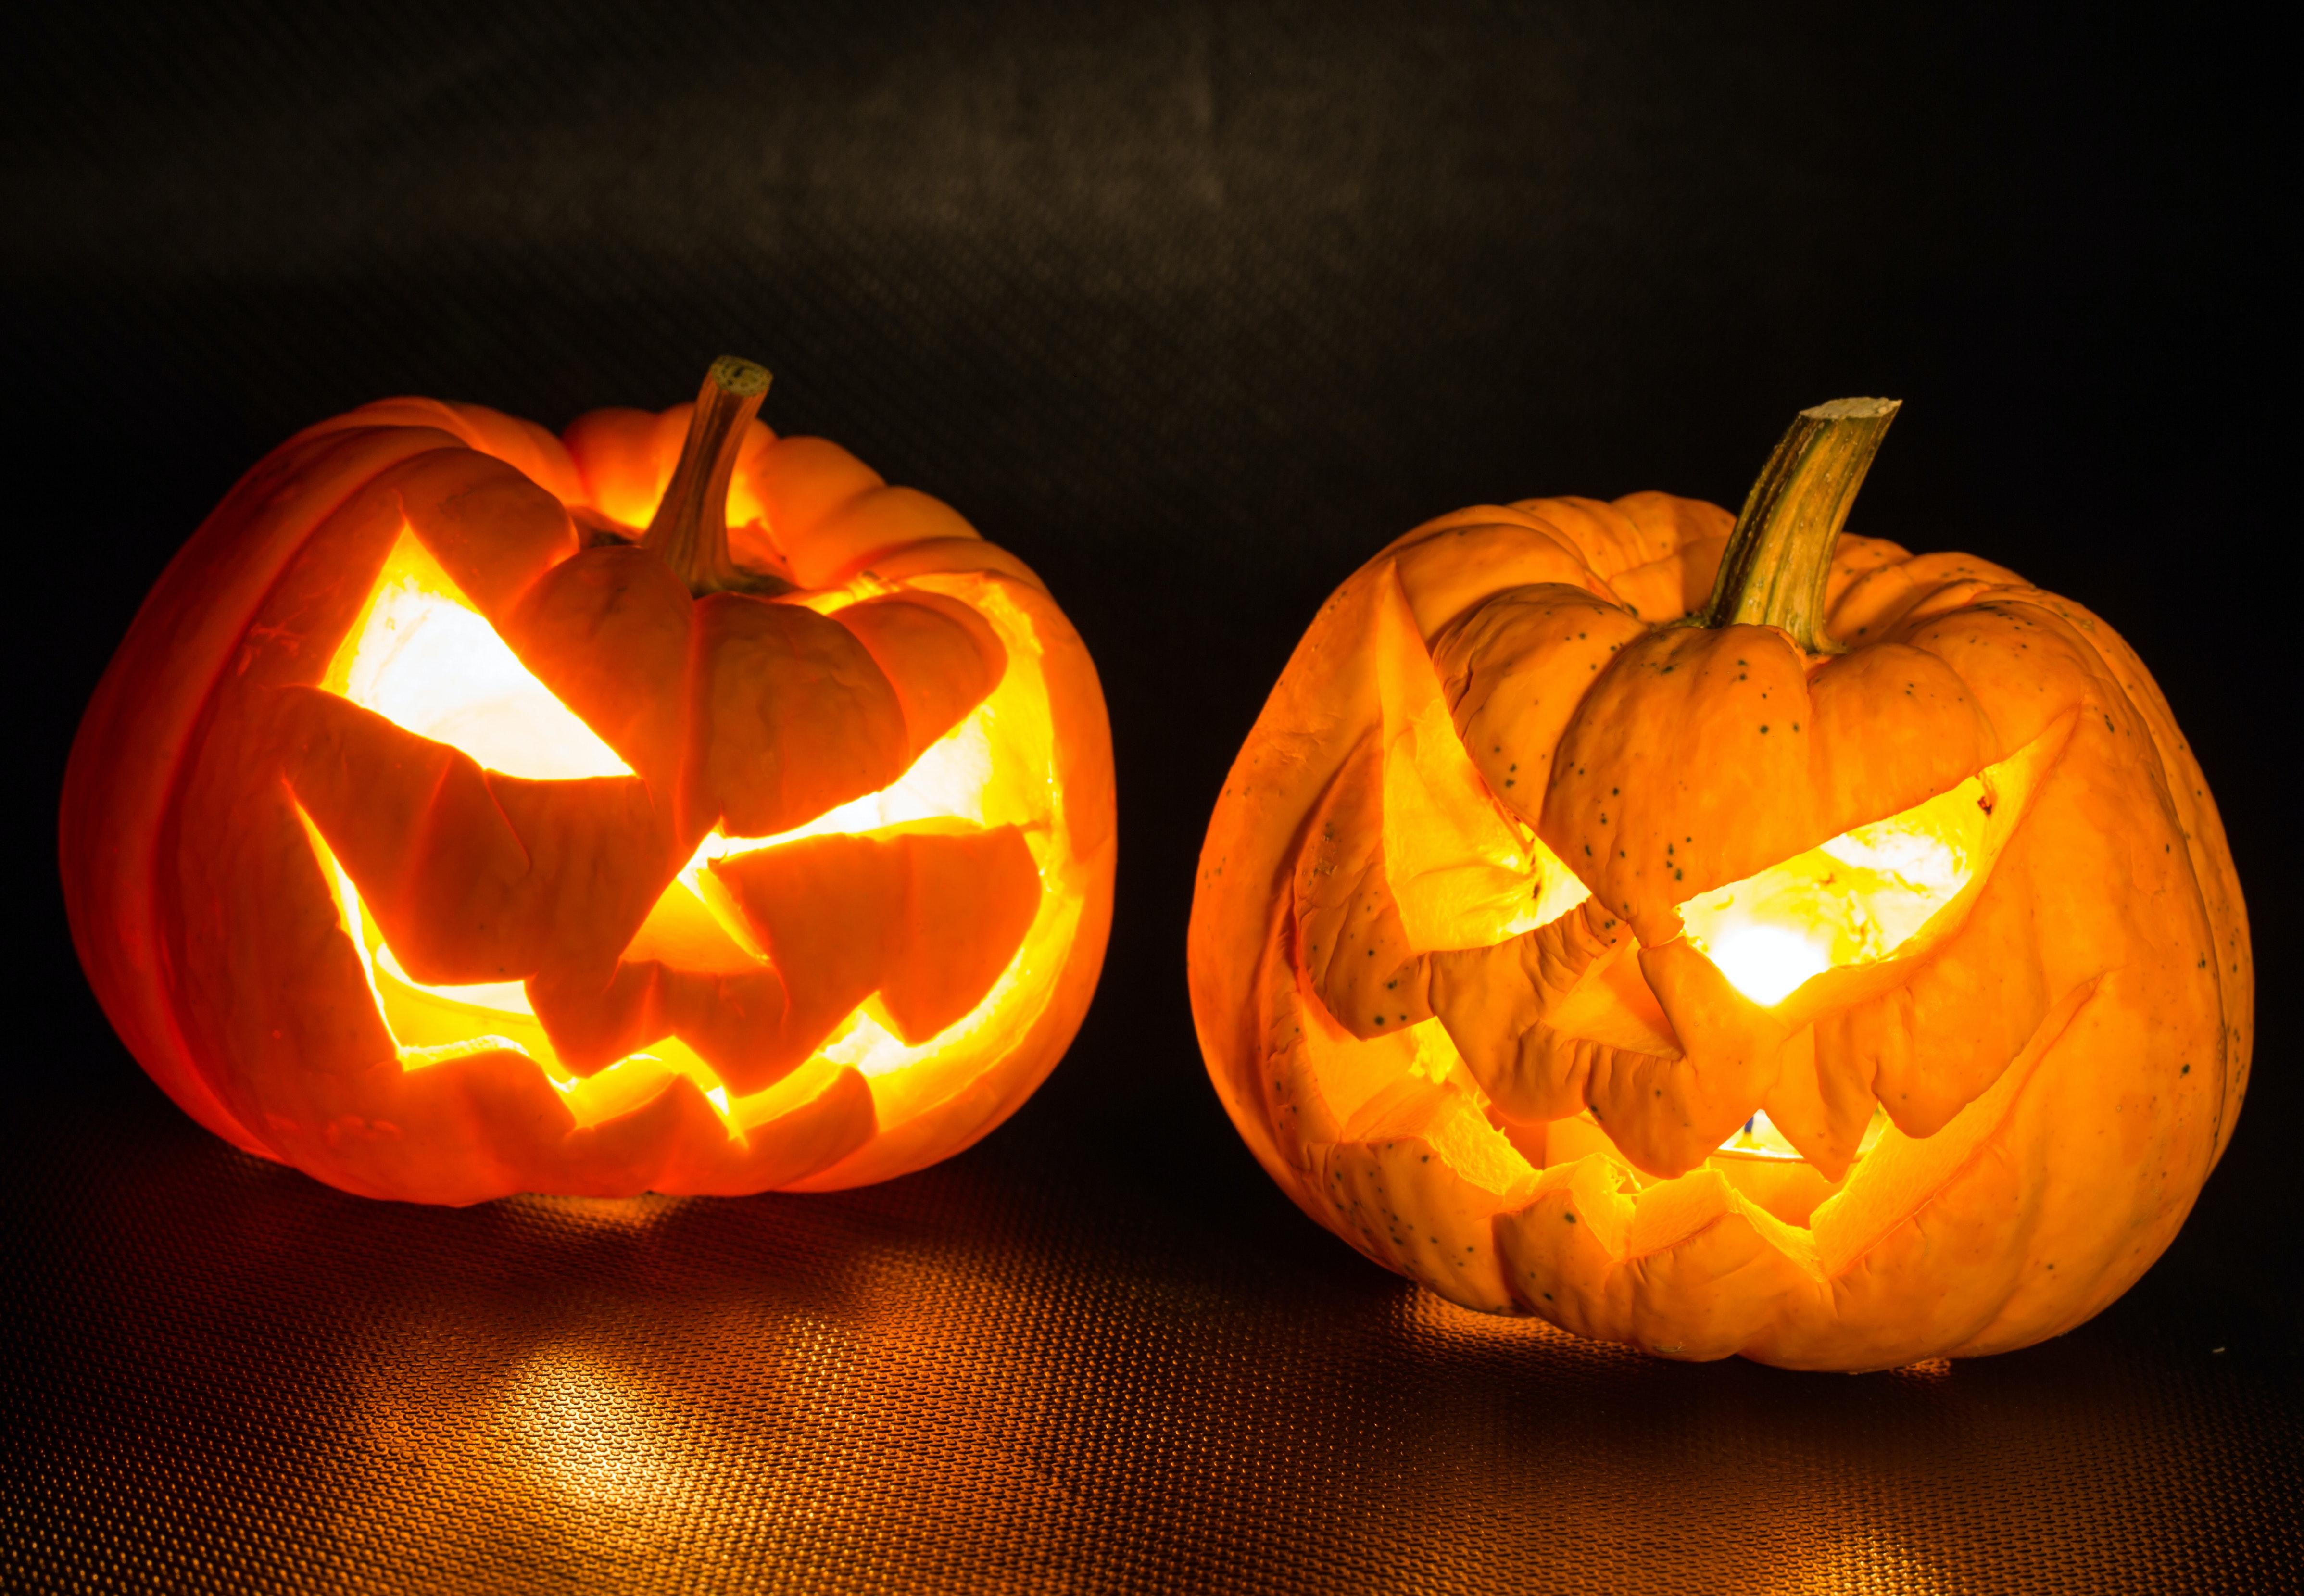 hvilken dag går man halloween